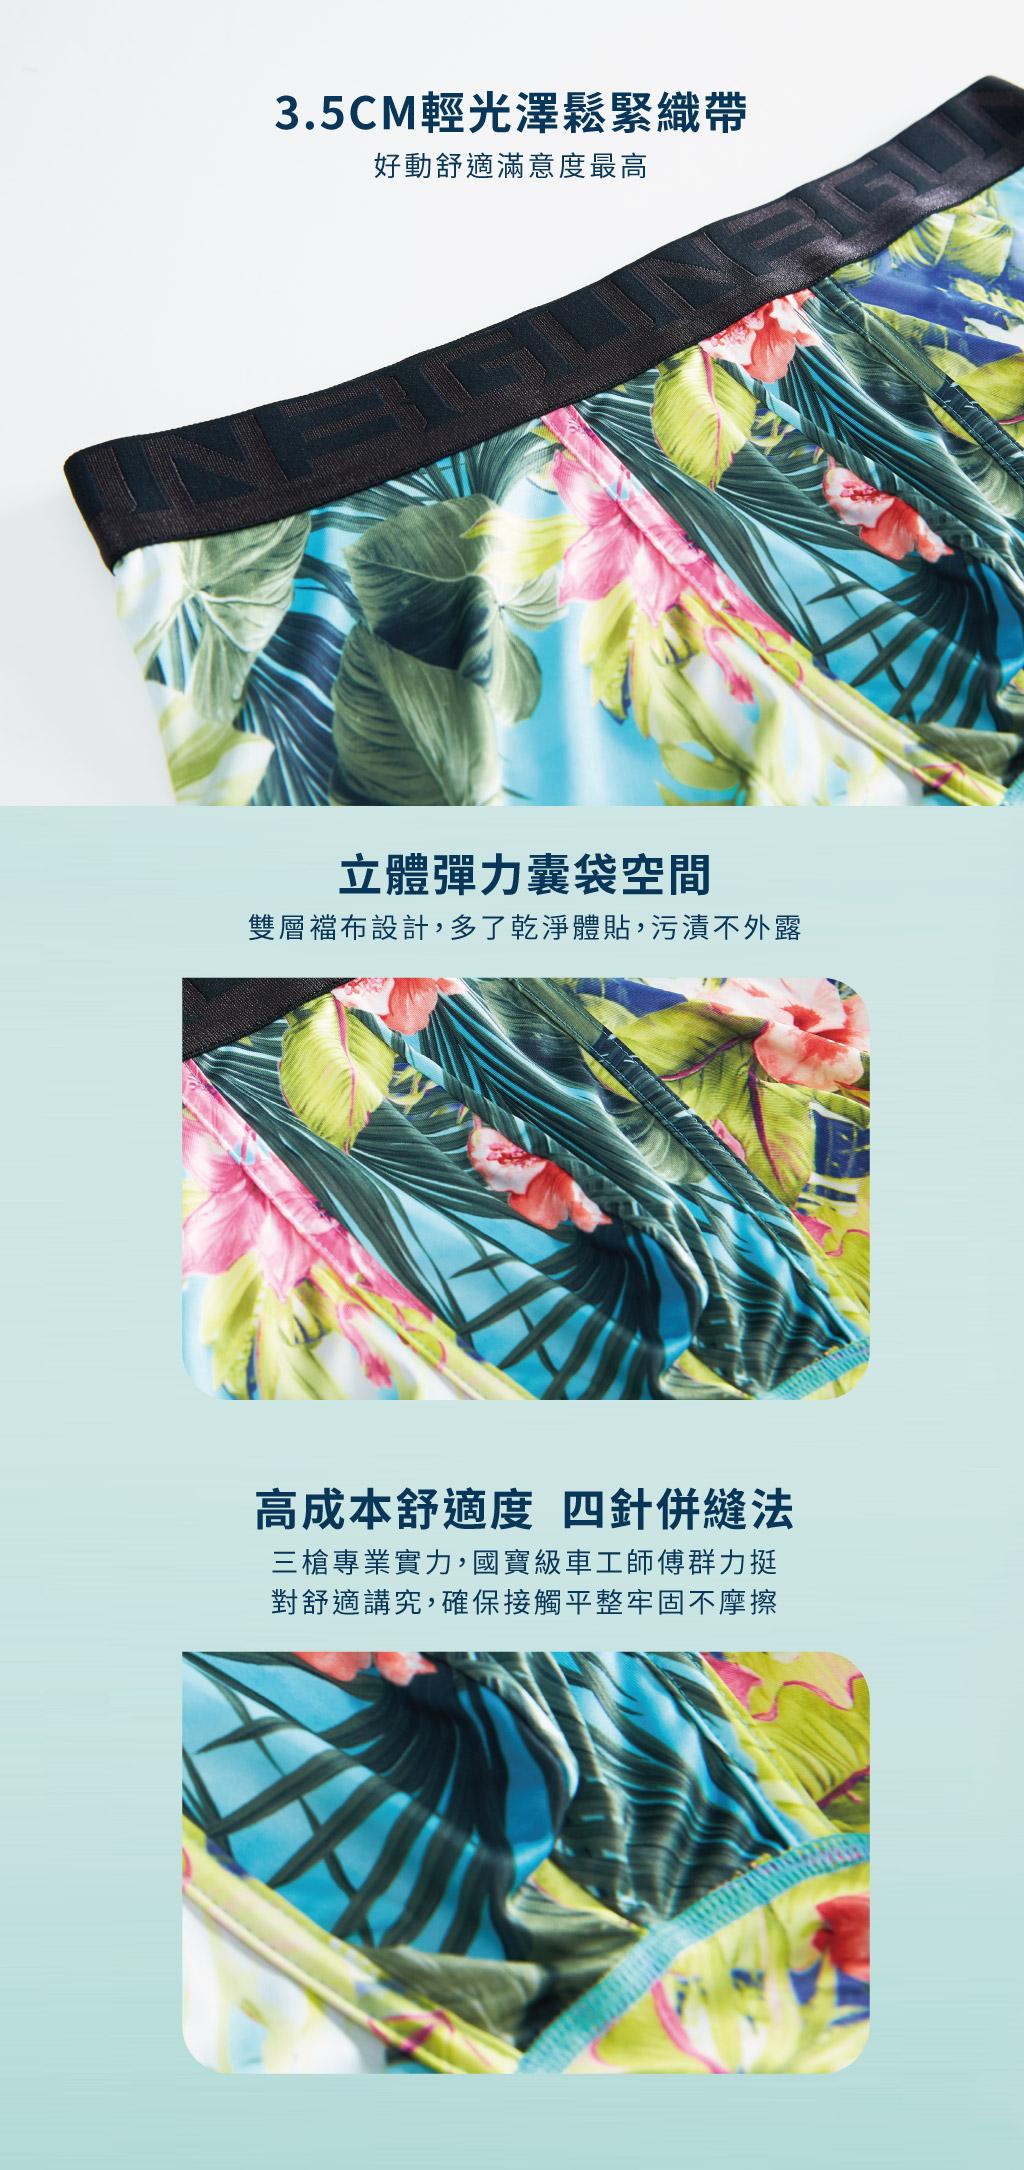 3GUN |男性時尚內衣褲MIT品牌-限量印花-狂野男永效吸排平口褲